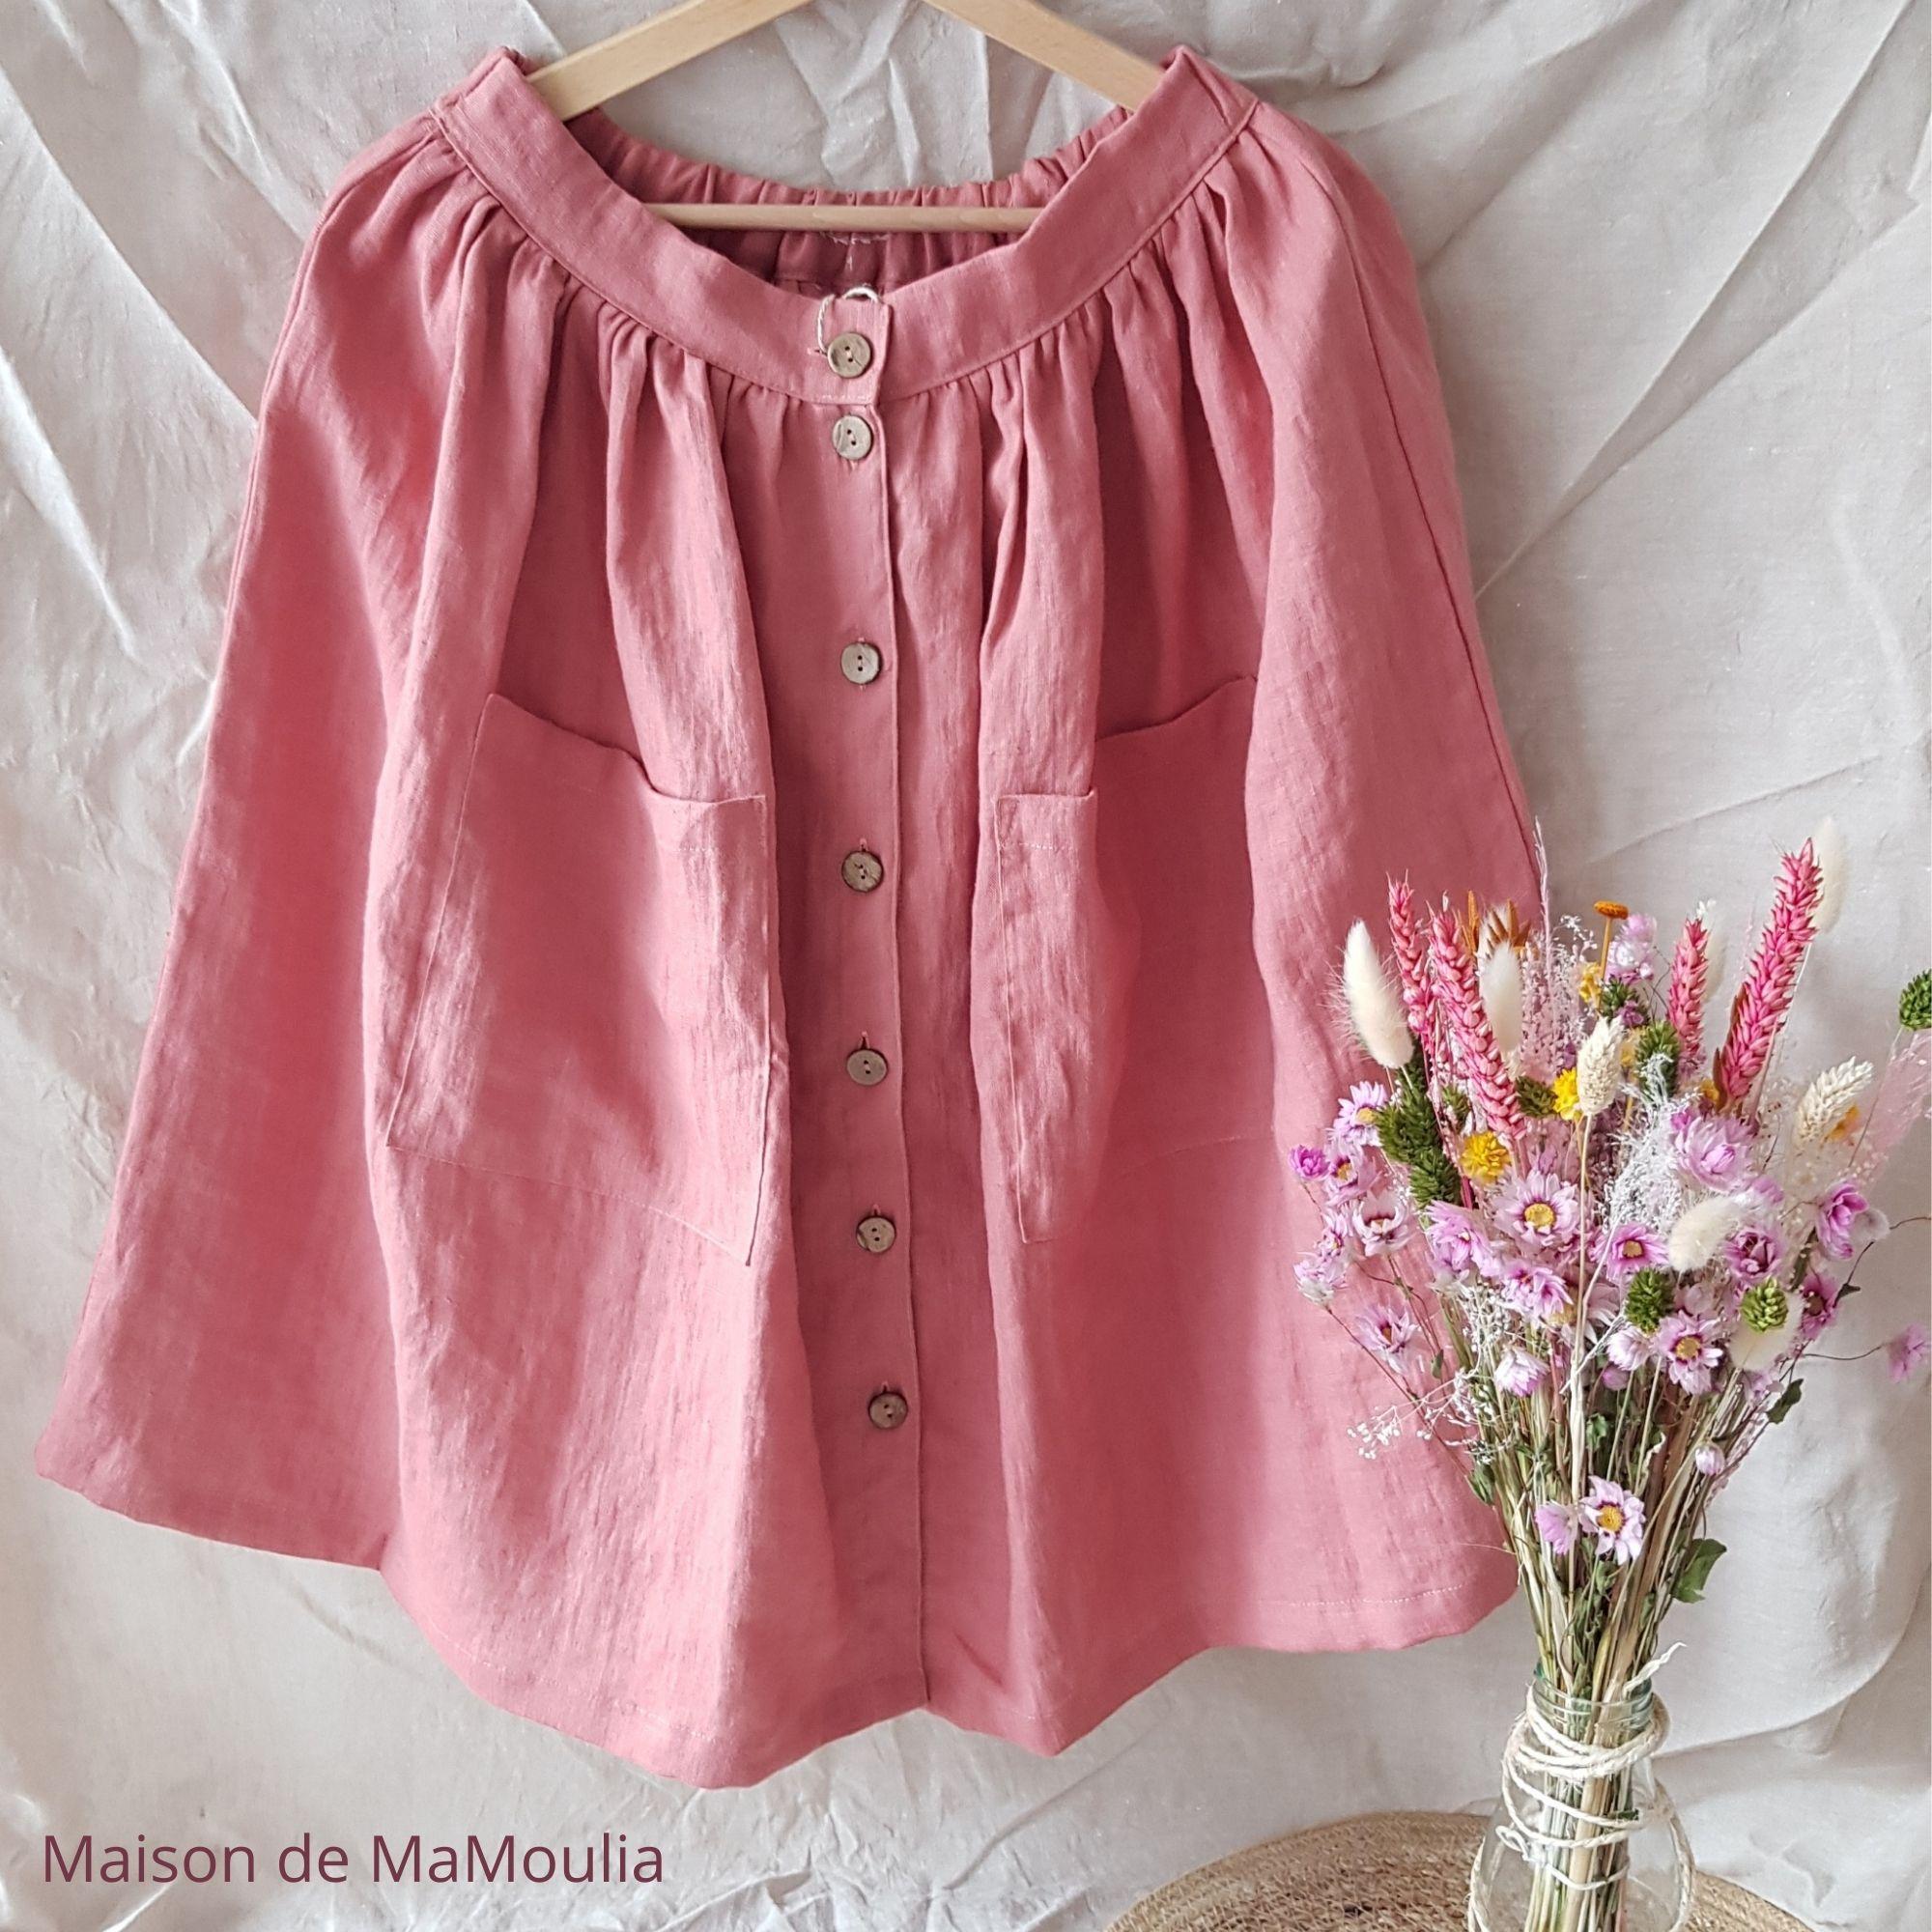 SIMPLY GREY - Jupe midi femme - 100% lin lavé - Rose - à boutons